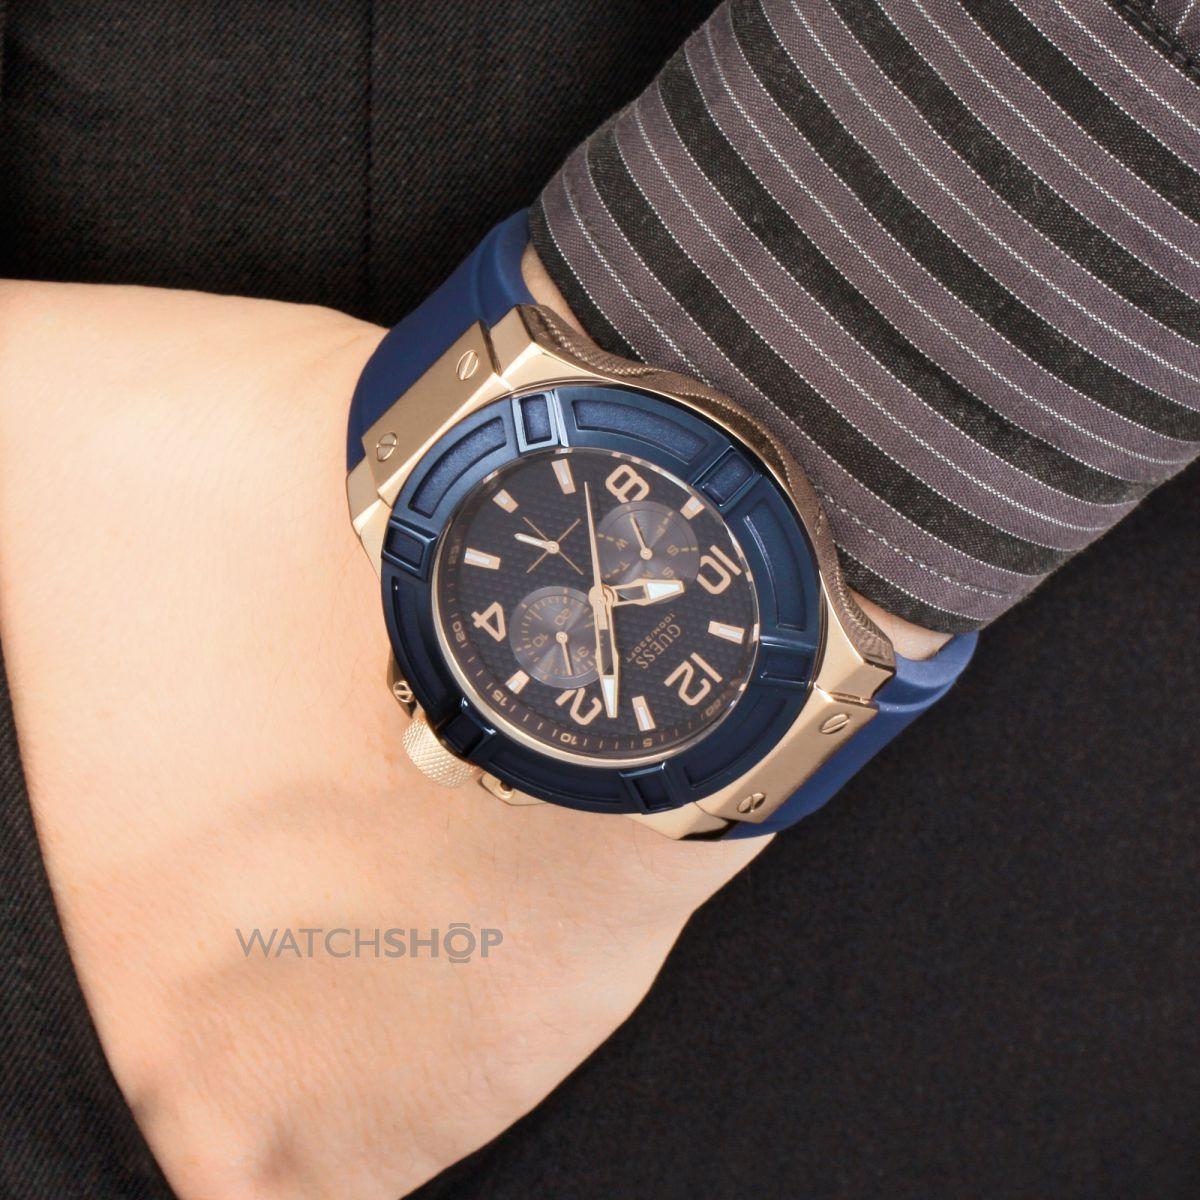 6e6d051b189b Наручные часы Guess Sport Steel W0247G3- купить по цене 70000.0 в ...